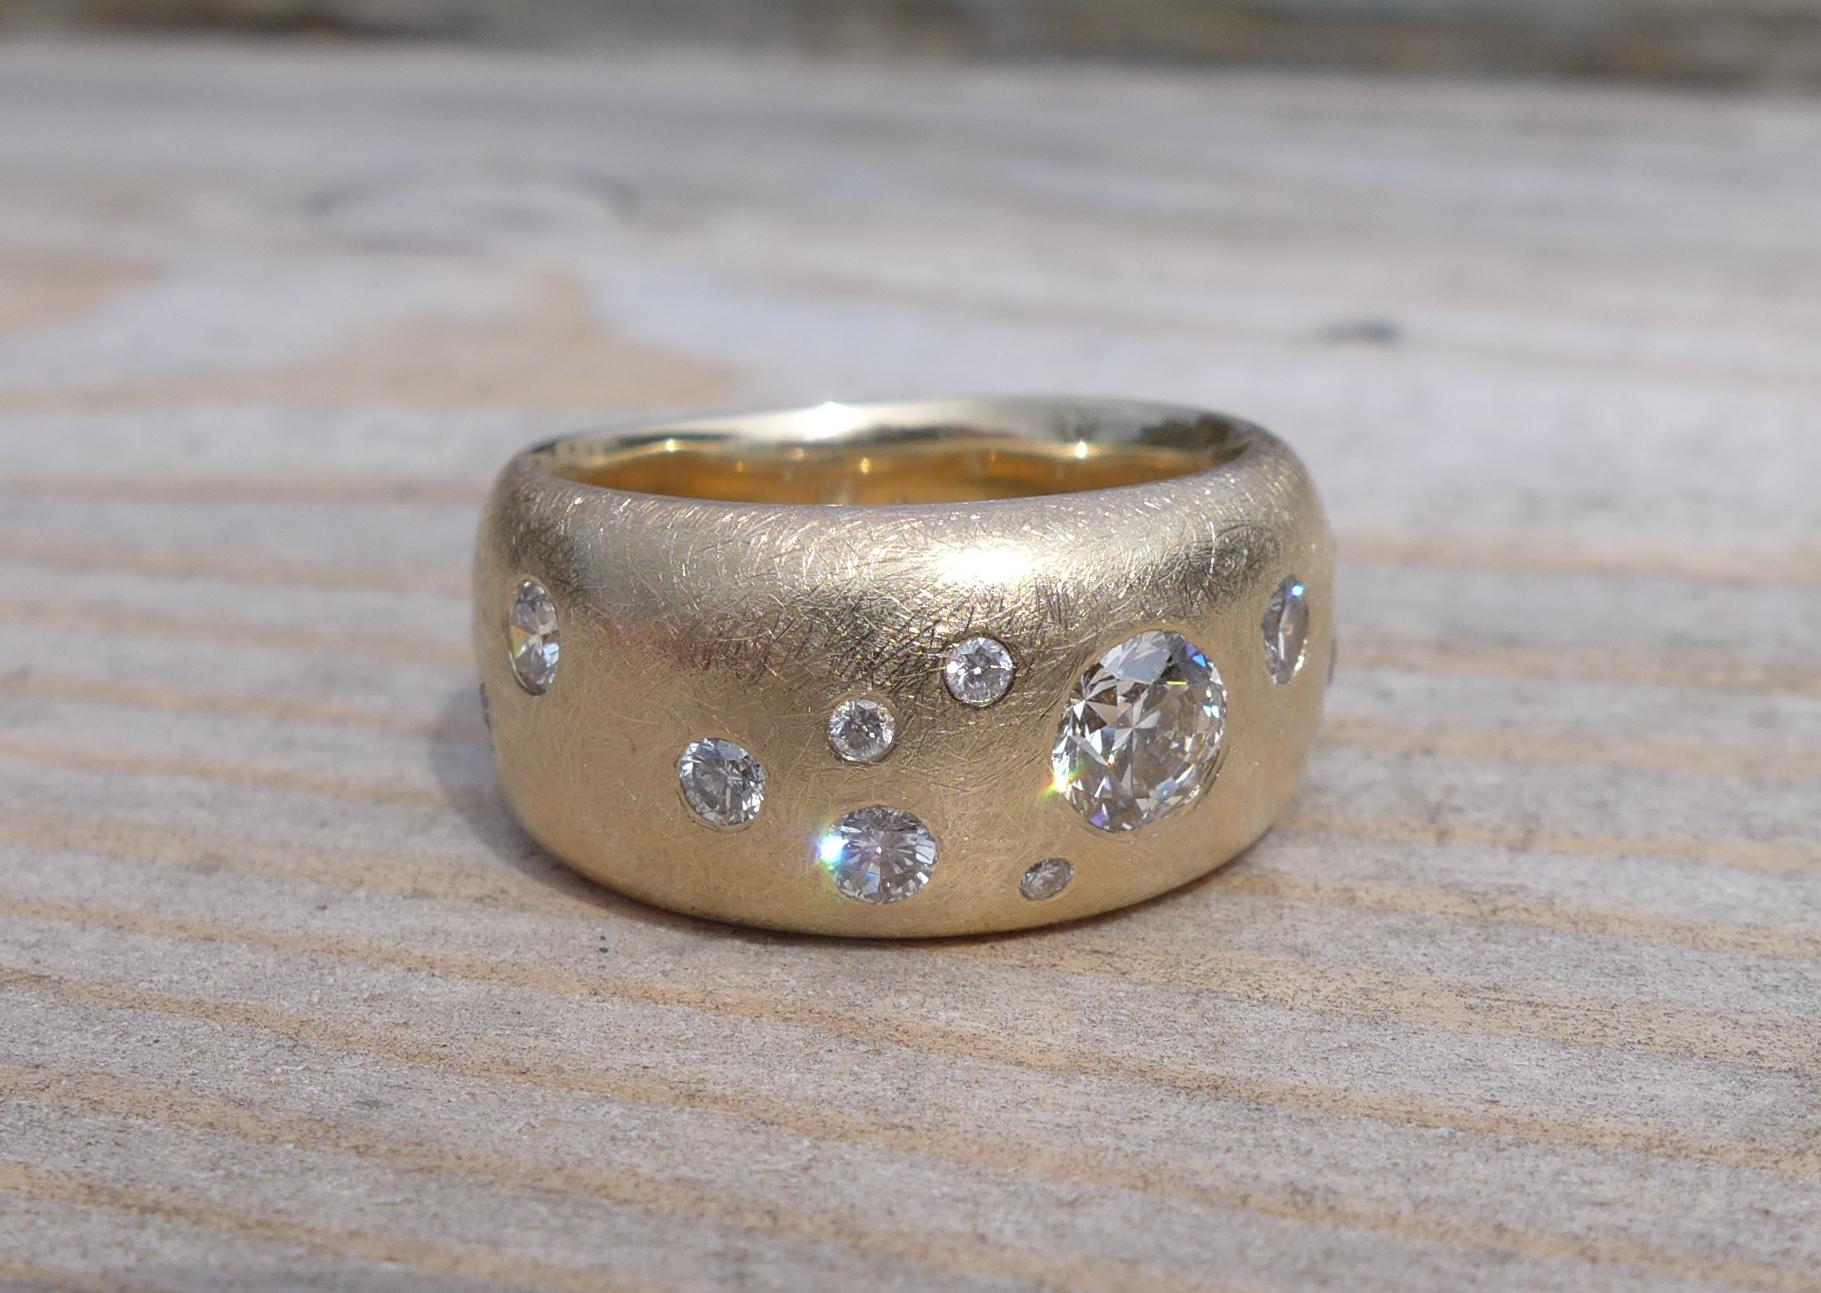 Wedding band, 14k yellow gold, diamonds